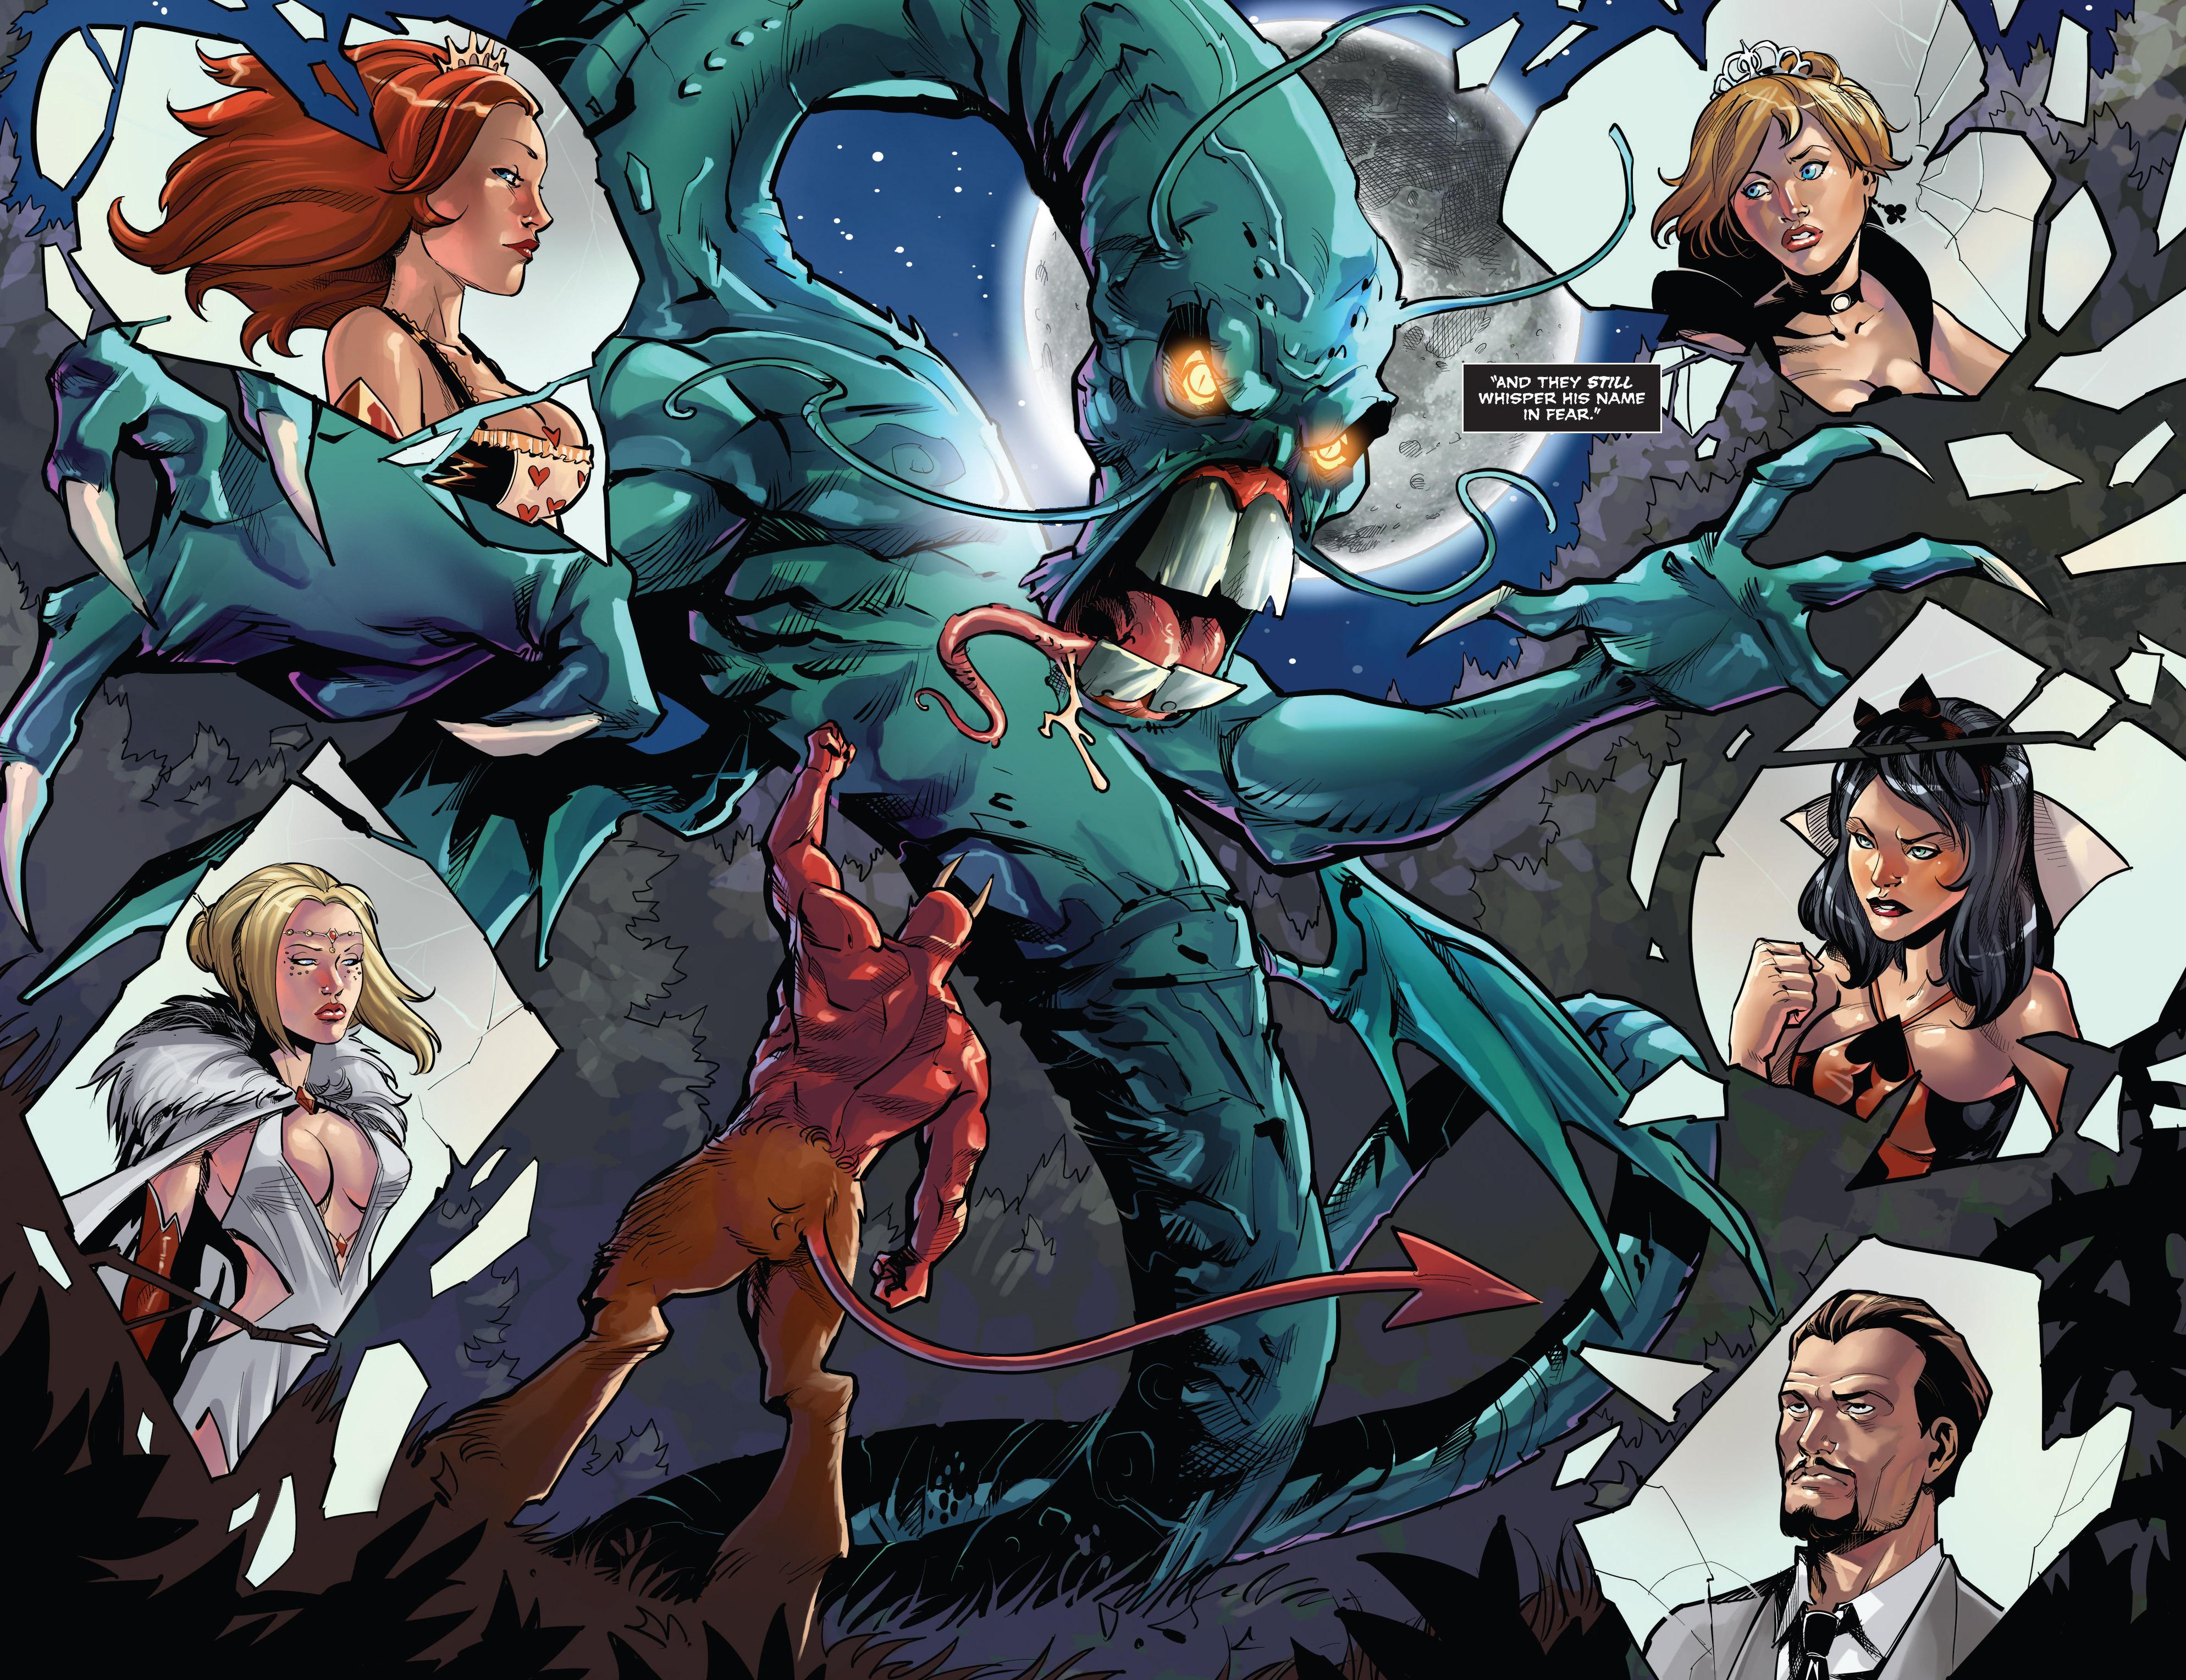 Read online Grimm Fairy Tales vs. Wonderland comic -  Issue #3 - 7